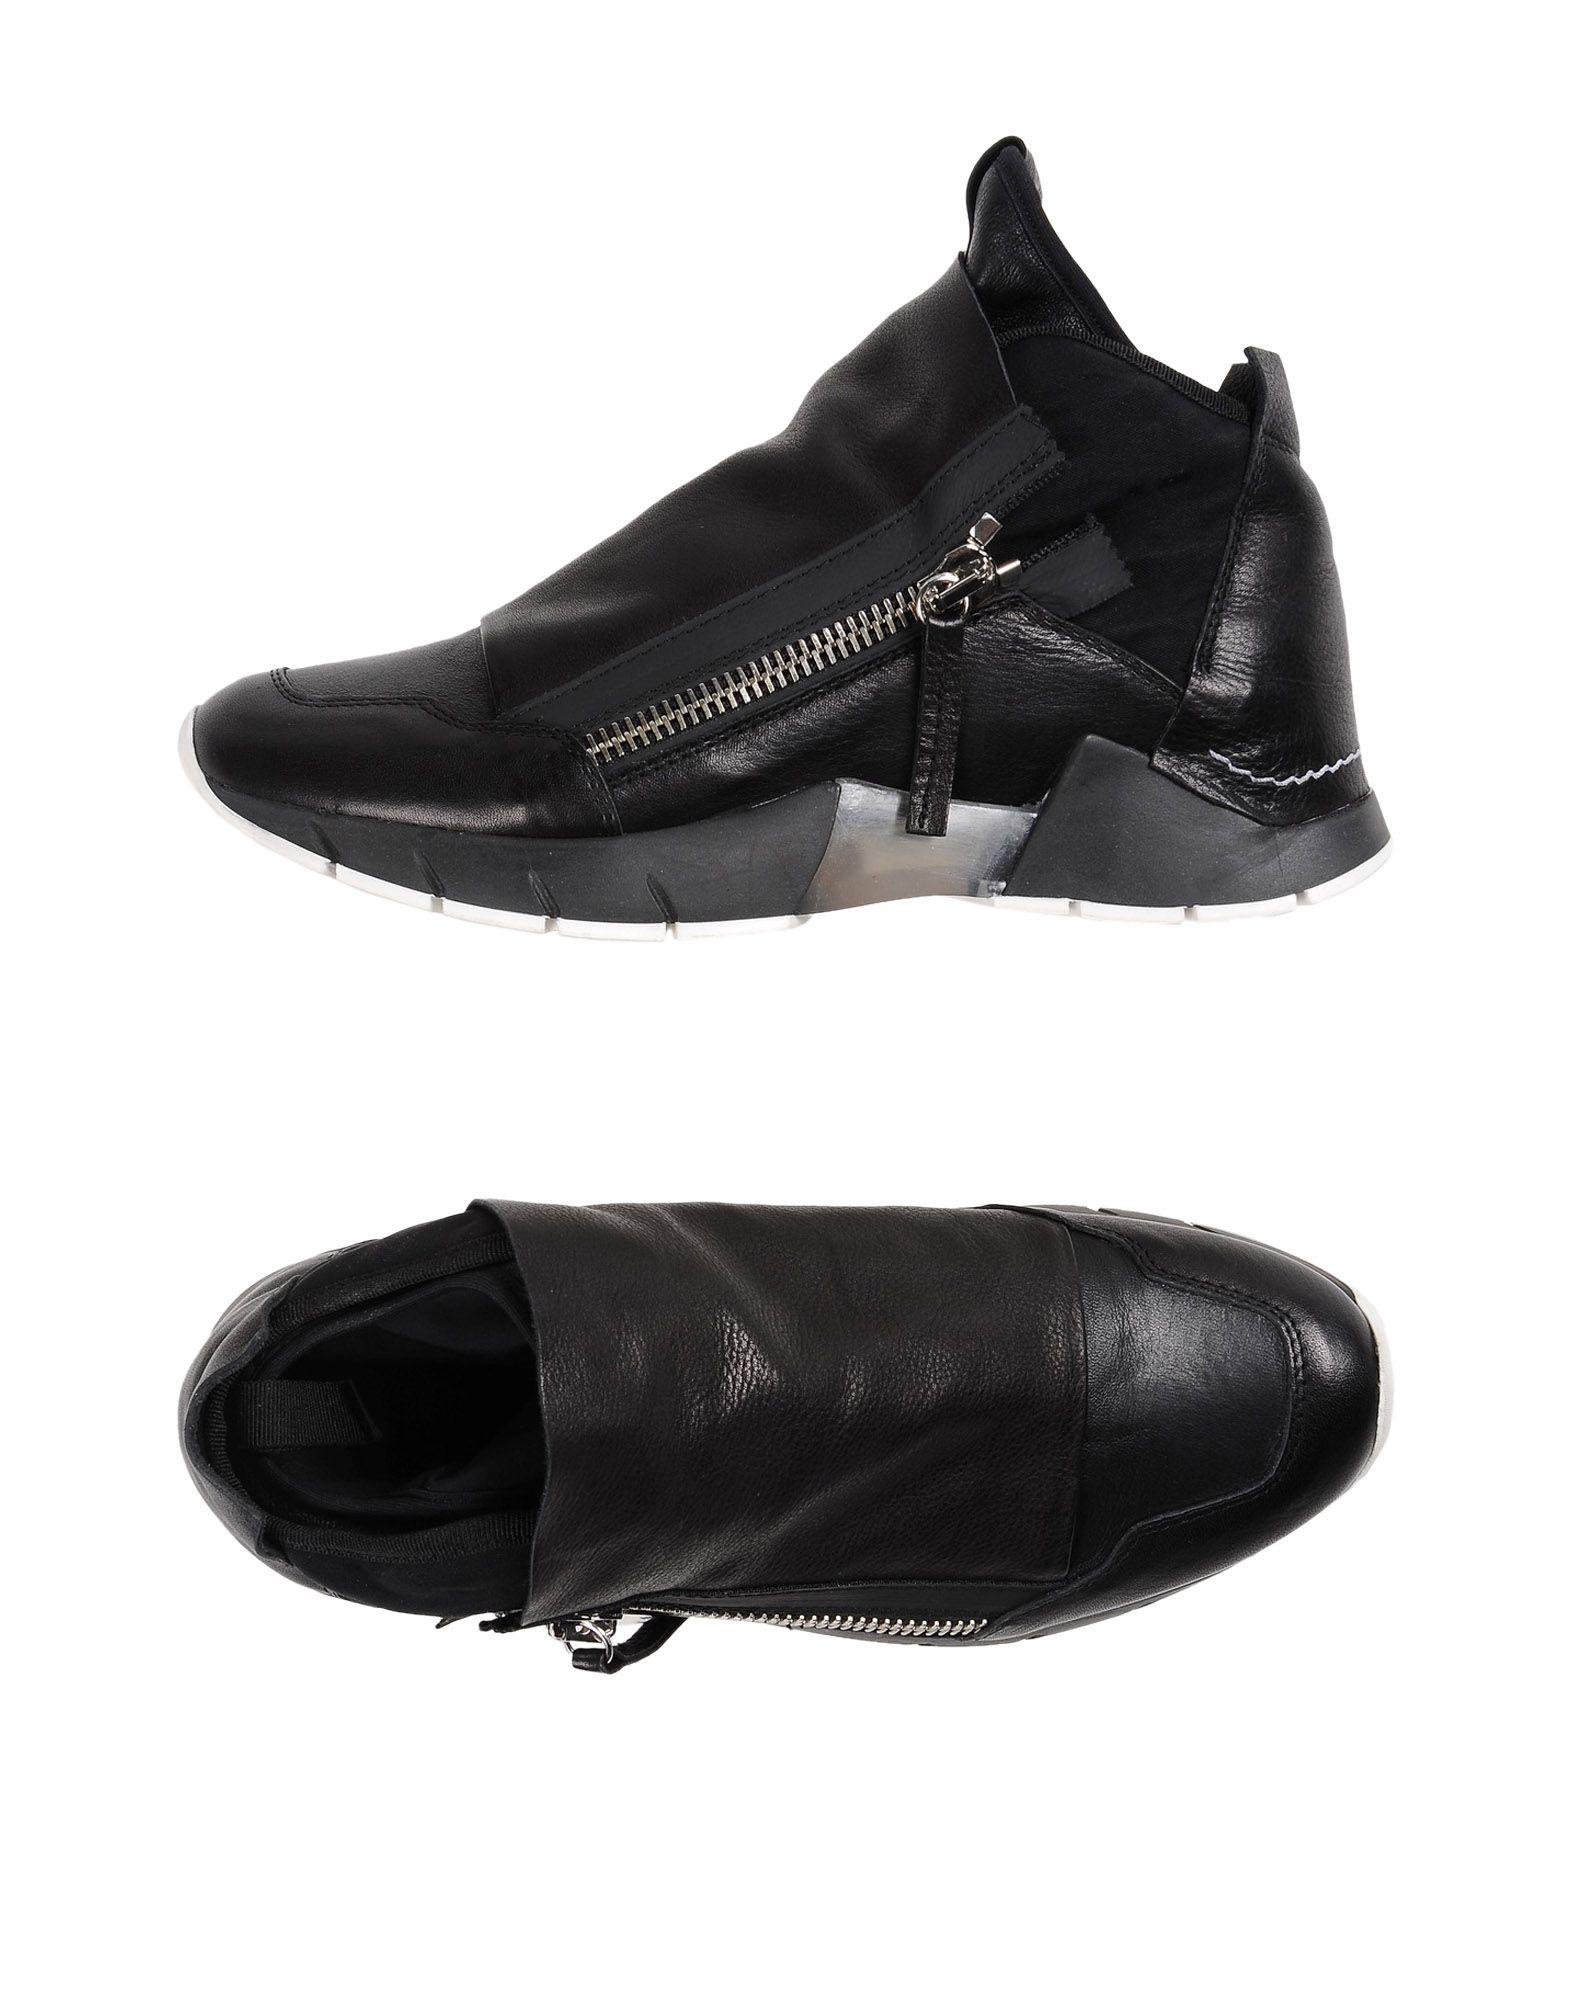 CA BY CINZIA ARAIA Sneakers in Black